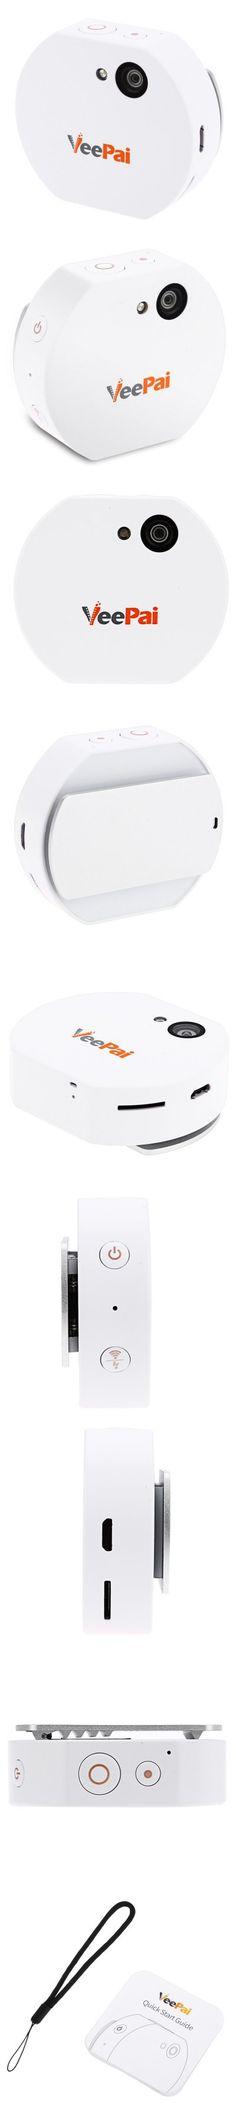 staffa midland xtc-200vp3 720p high definition wearable action camera